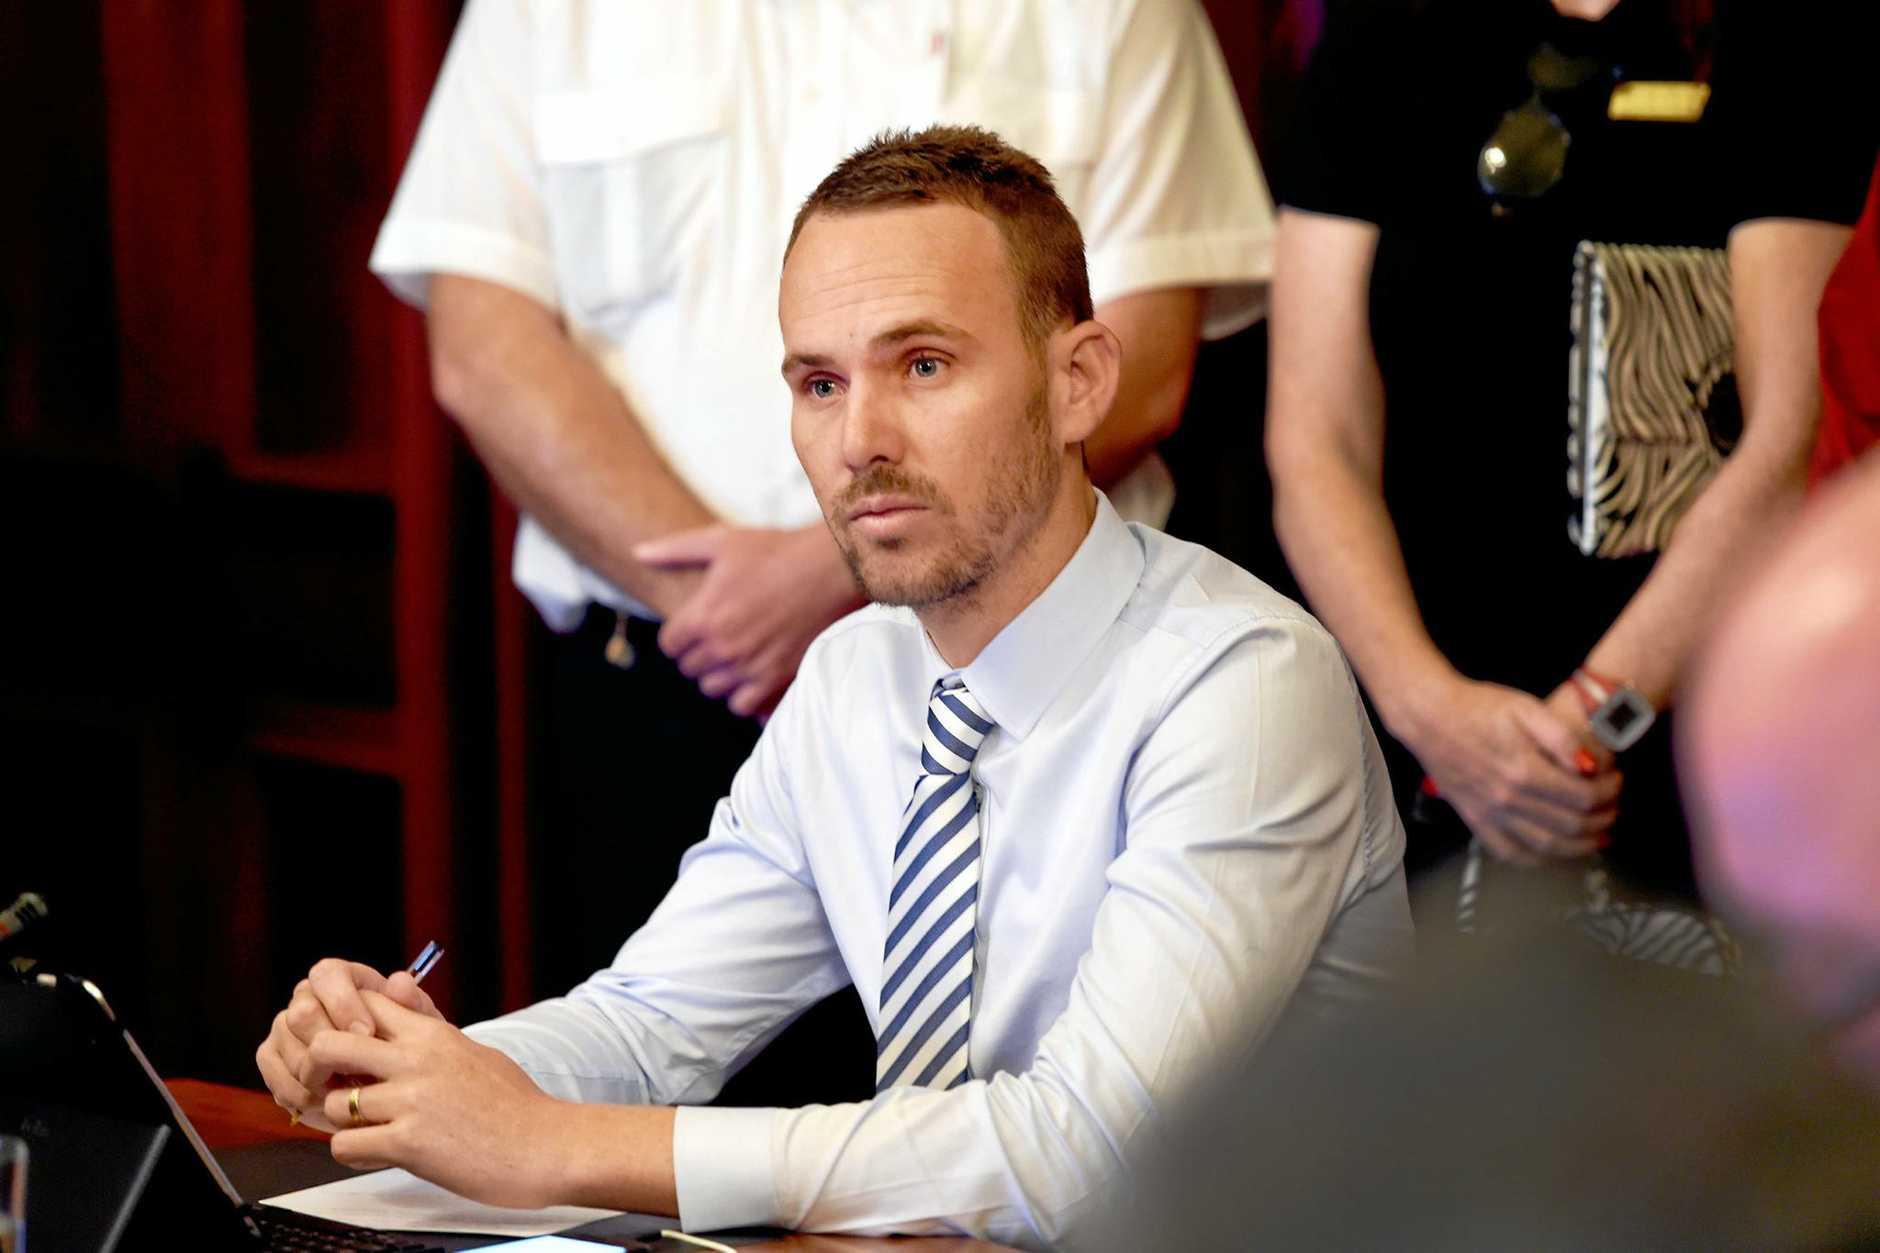 Fraser Coast Regional Council meeting, Maryborough Chambers - Councillor Daniel Sanderson.